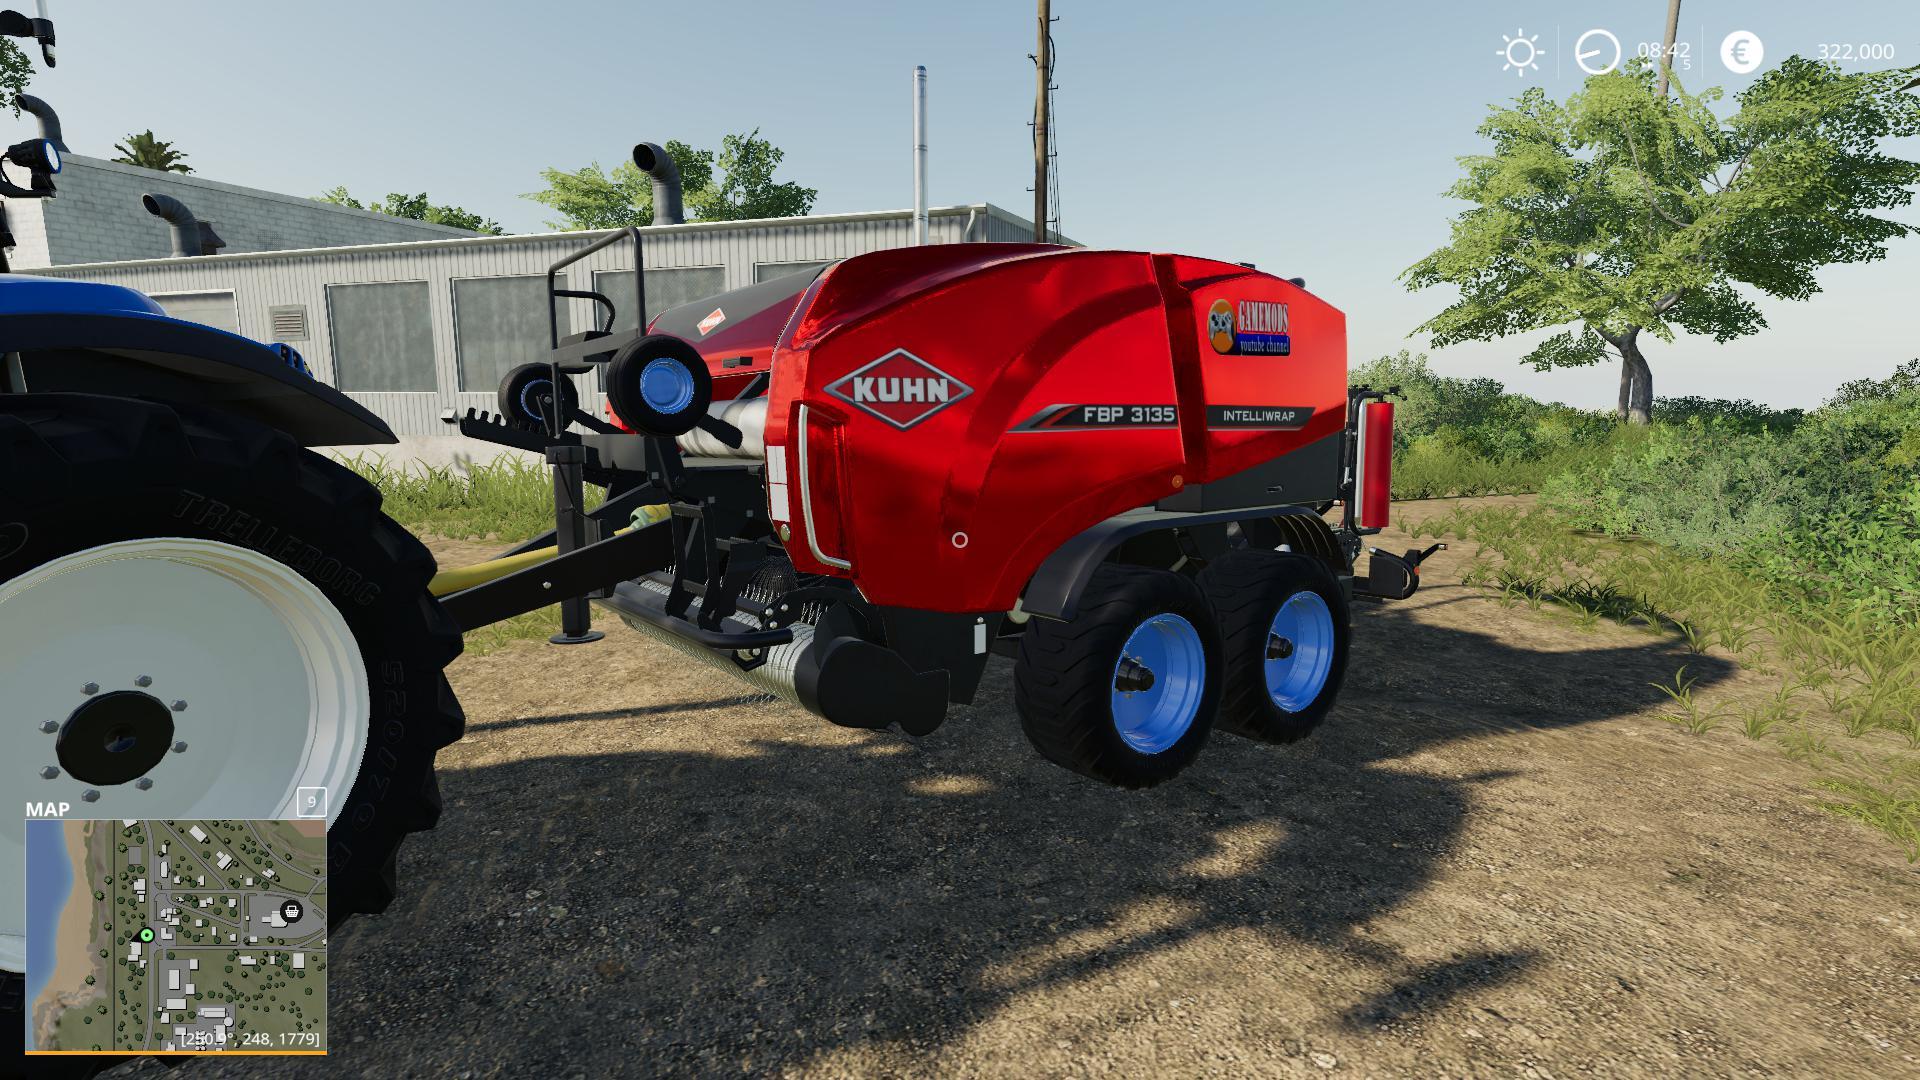 silage baler with 10 meter width v1 0 for FS 19 - Farming Simulator